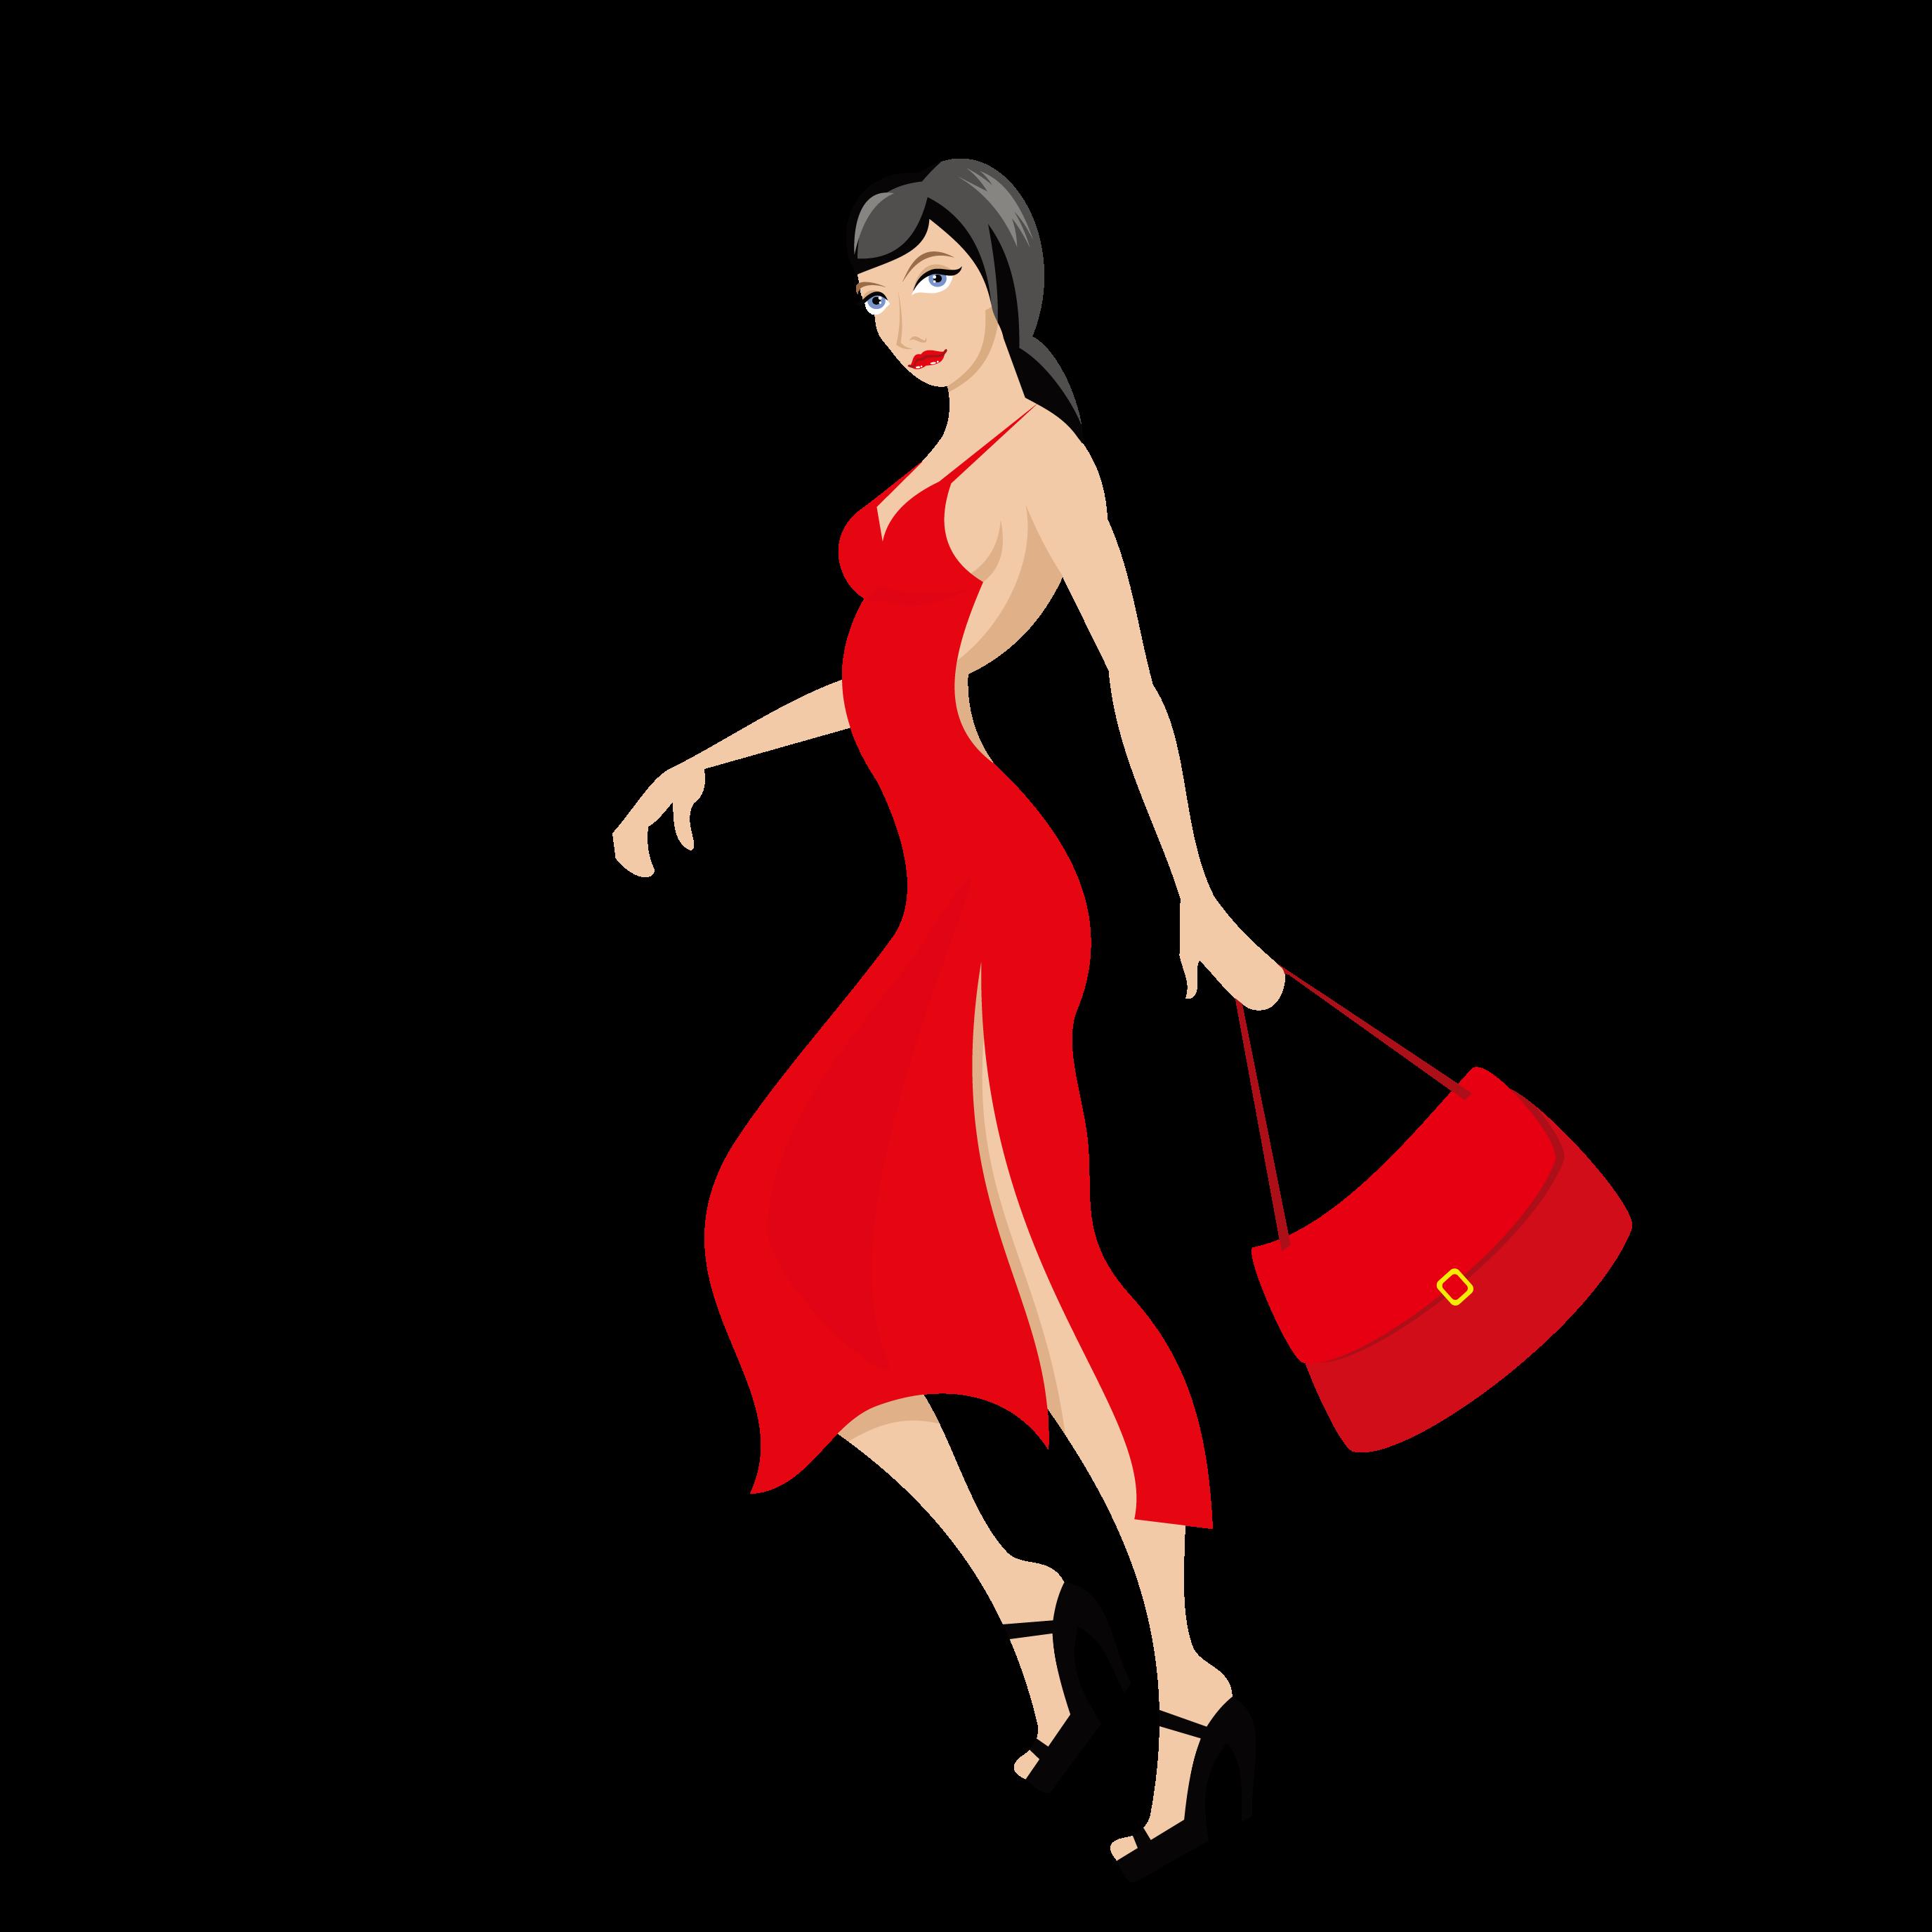 Fashion clipart fashion drawing. Dress red wearing a